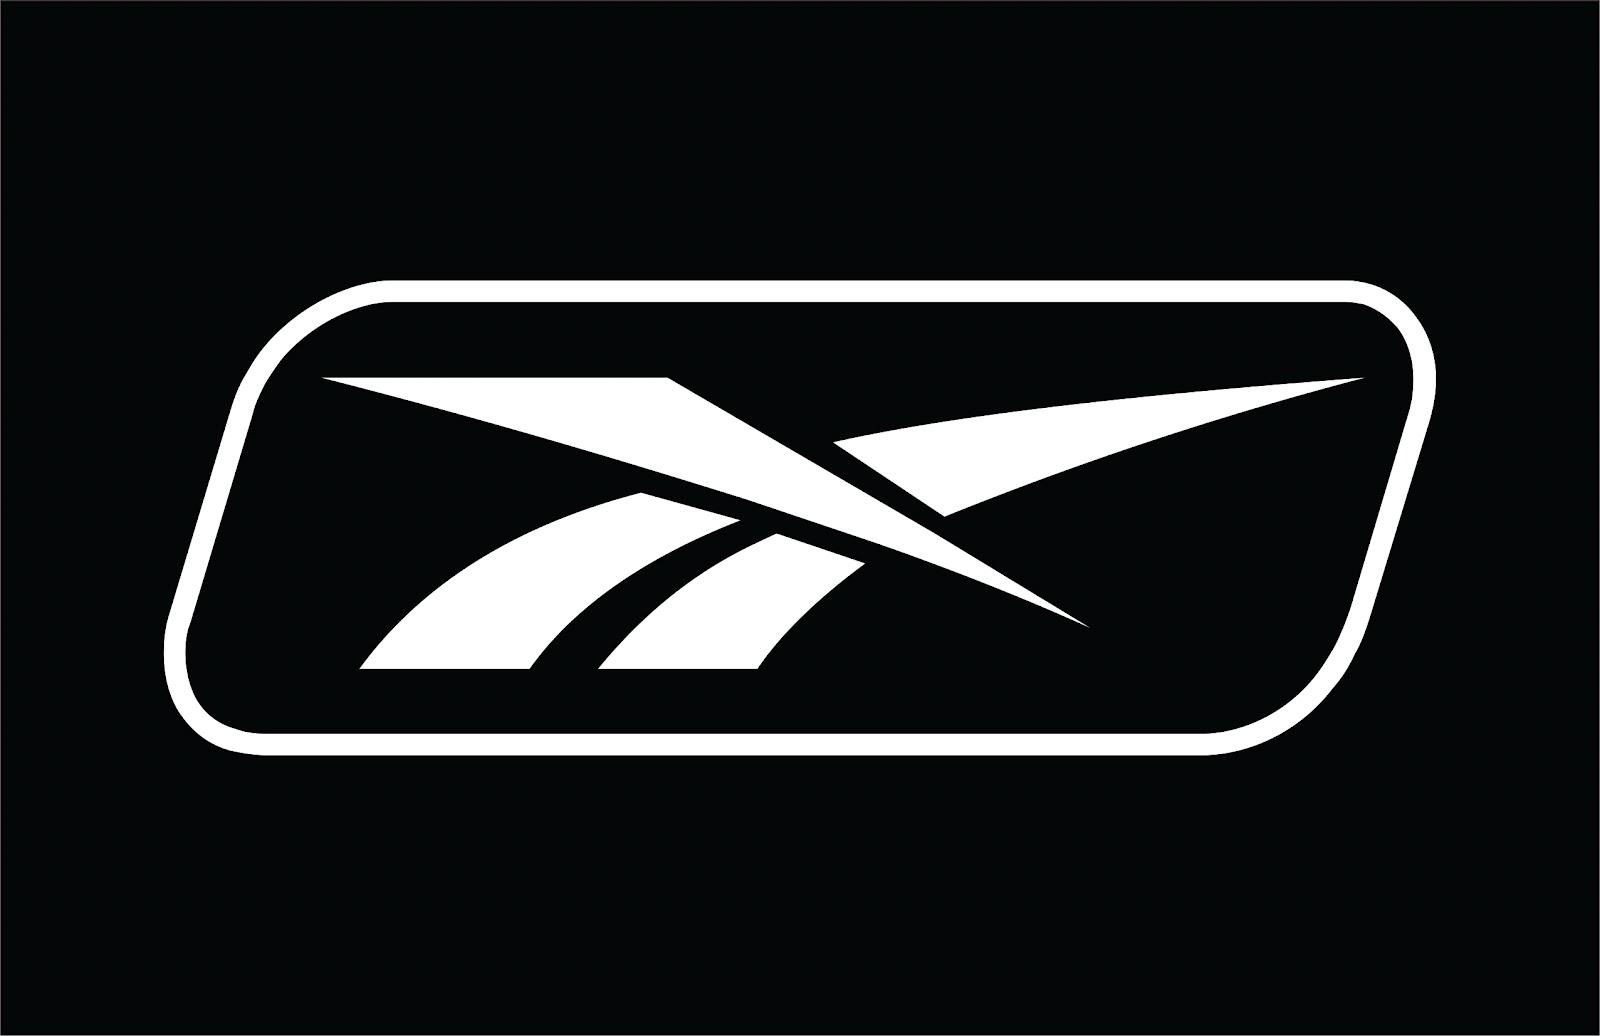 Reebook Logo Wallpaper